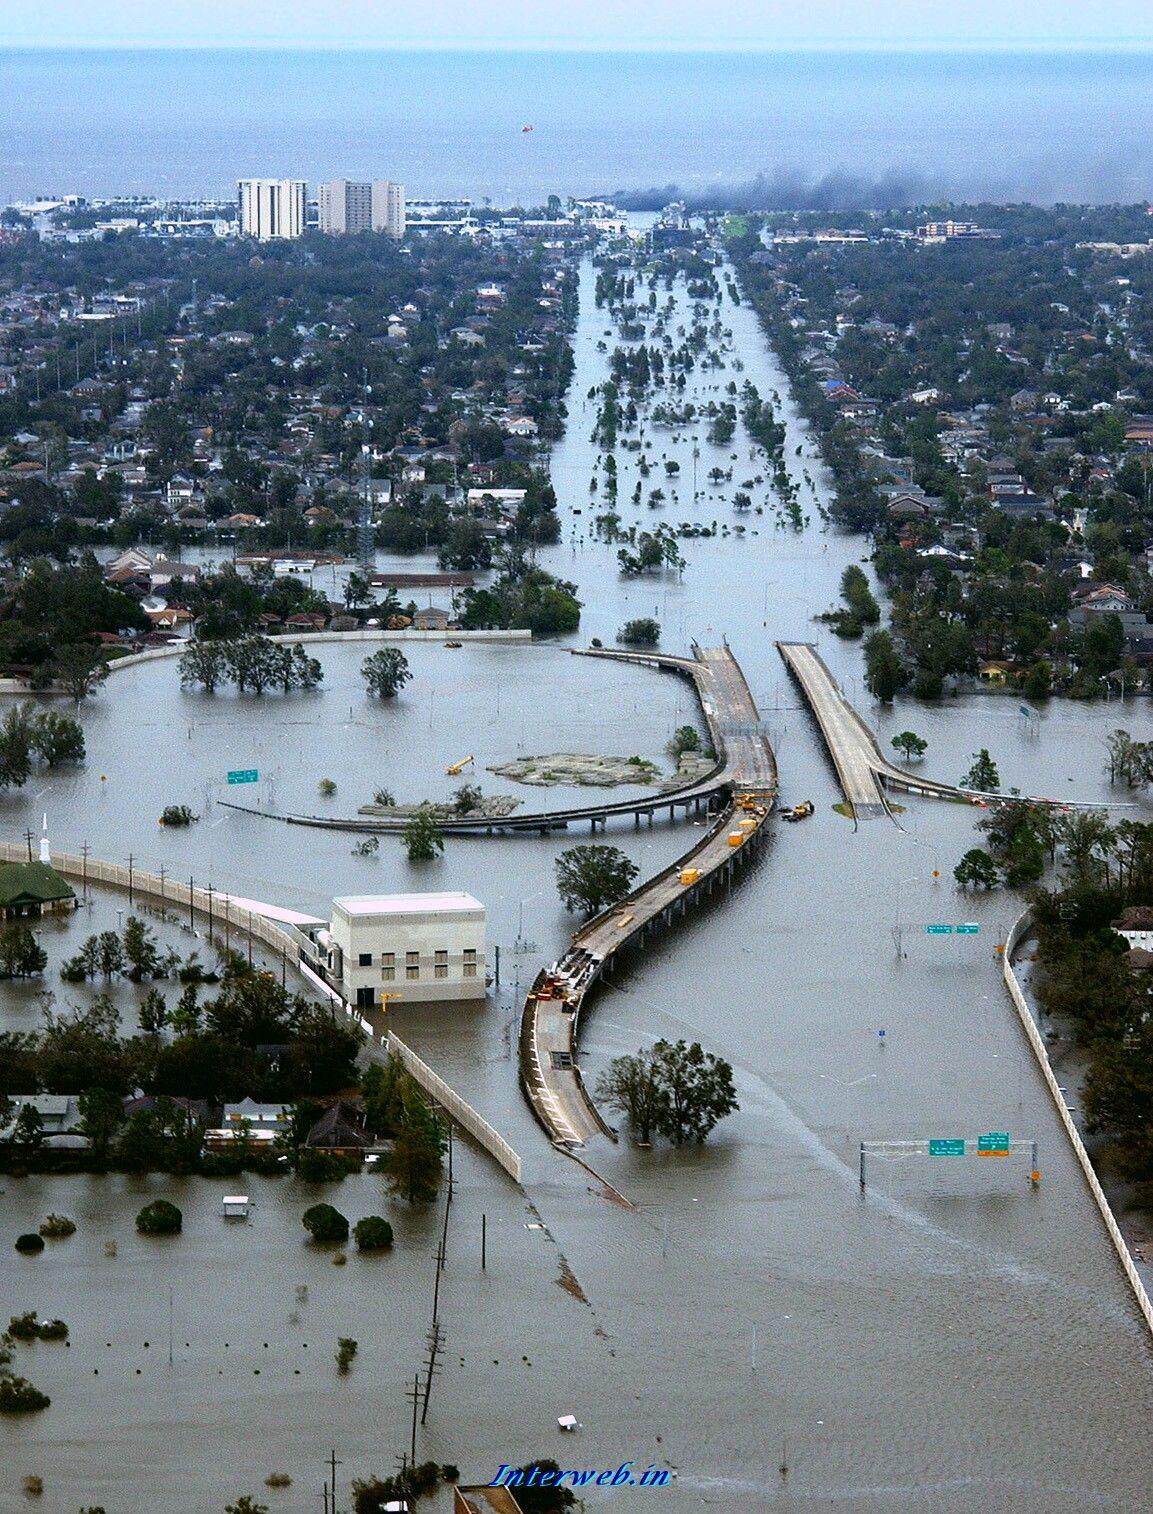 Disasters Pictures Name Natural Disasters2 Jpgviews 30385size 633 3 Kb Hurricane Katrina Natural Disasters Nature